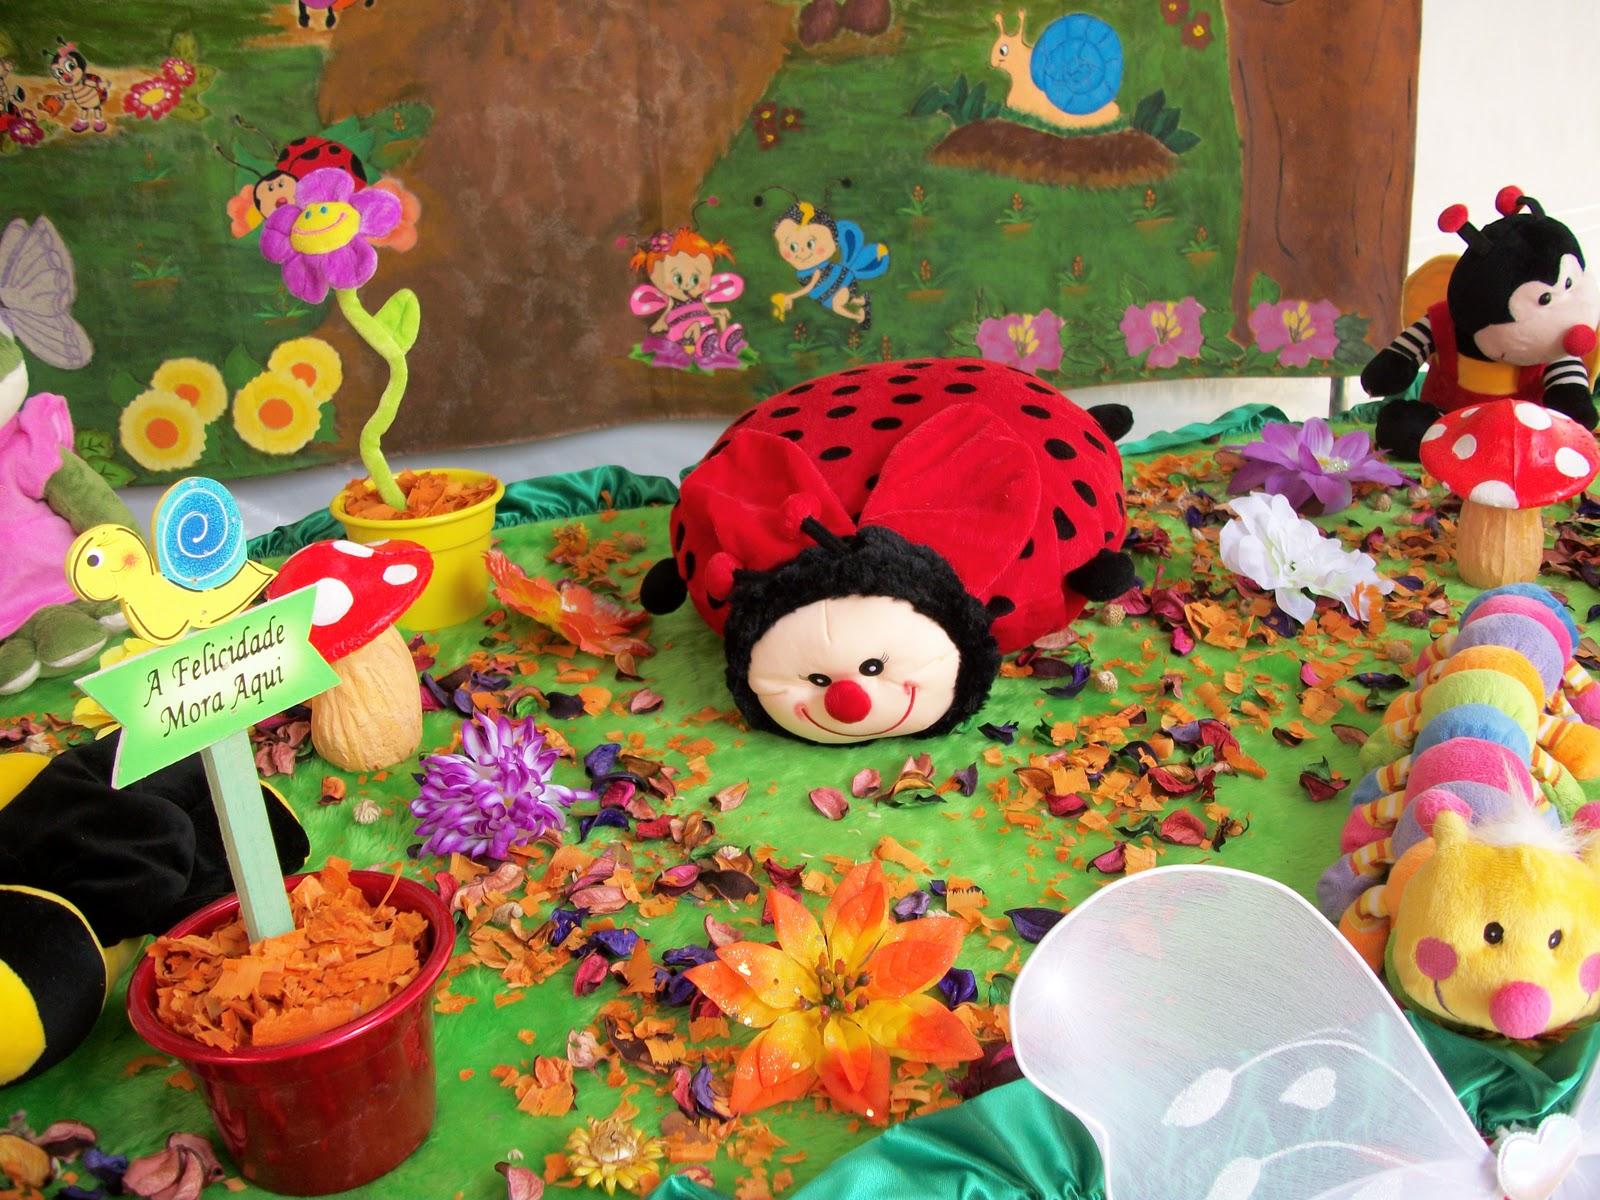 decoracao quarto de bebe jardim encantado : decoracao quarto de bebe jardim encantado:Doce Encanto Decoração ***: Decoração Tema Jardim Encantado